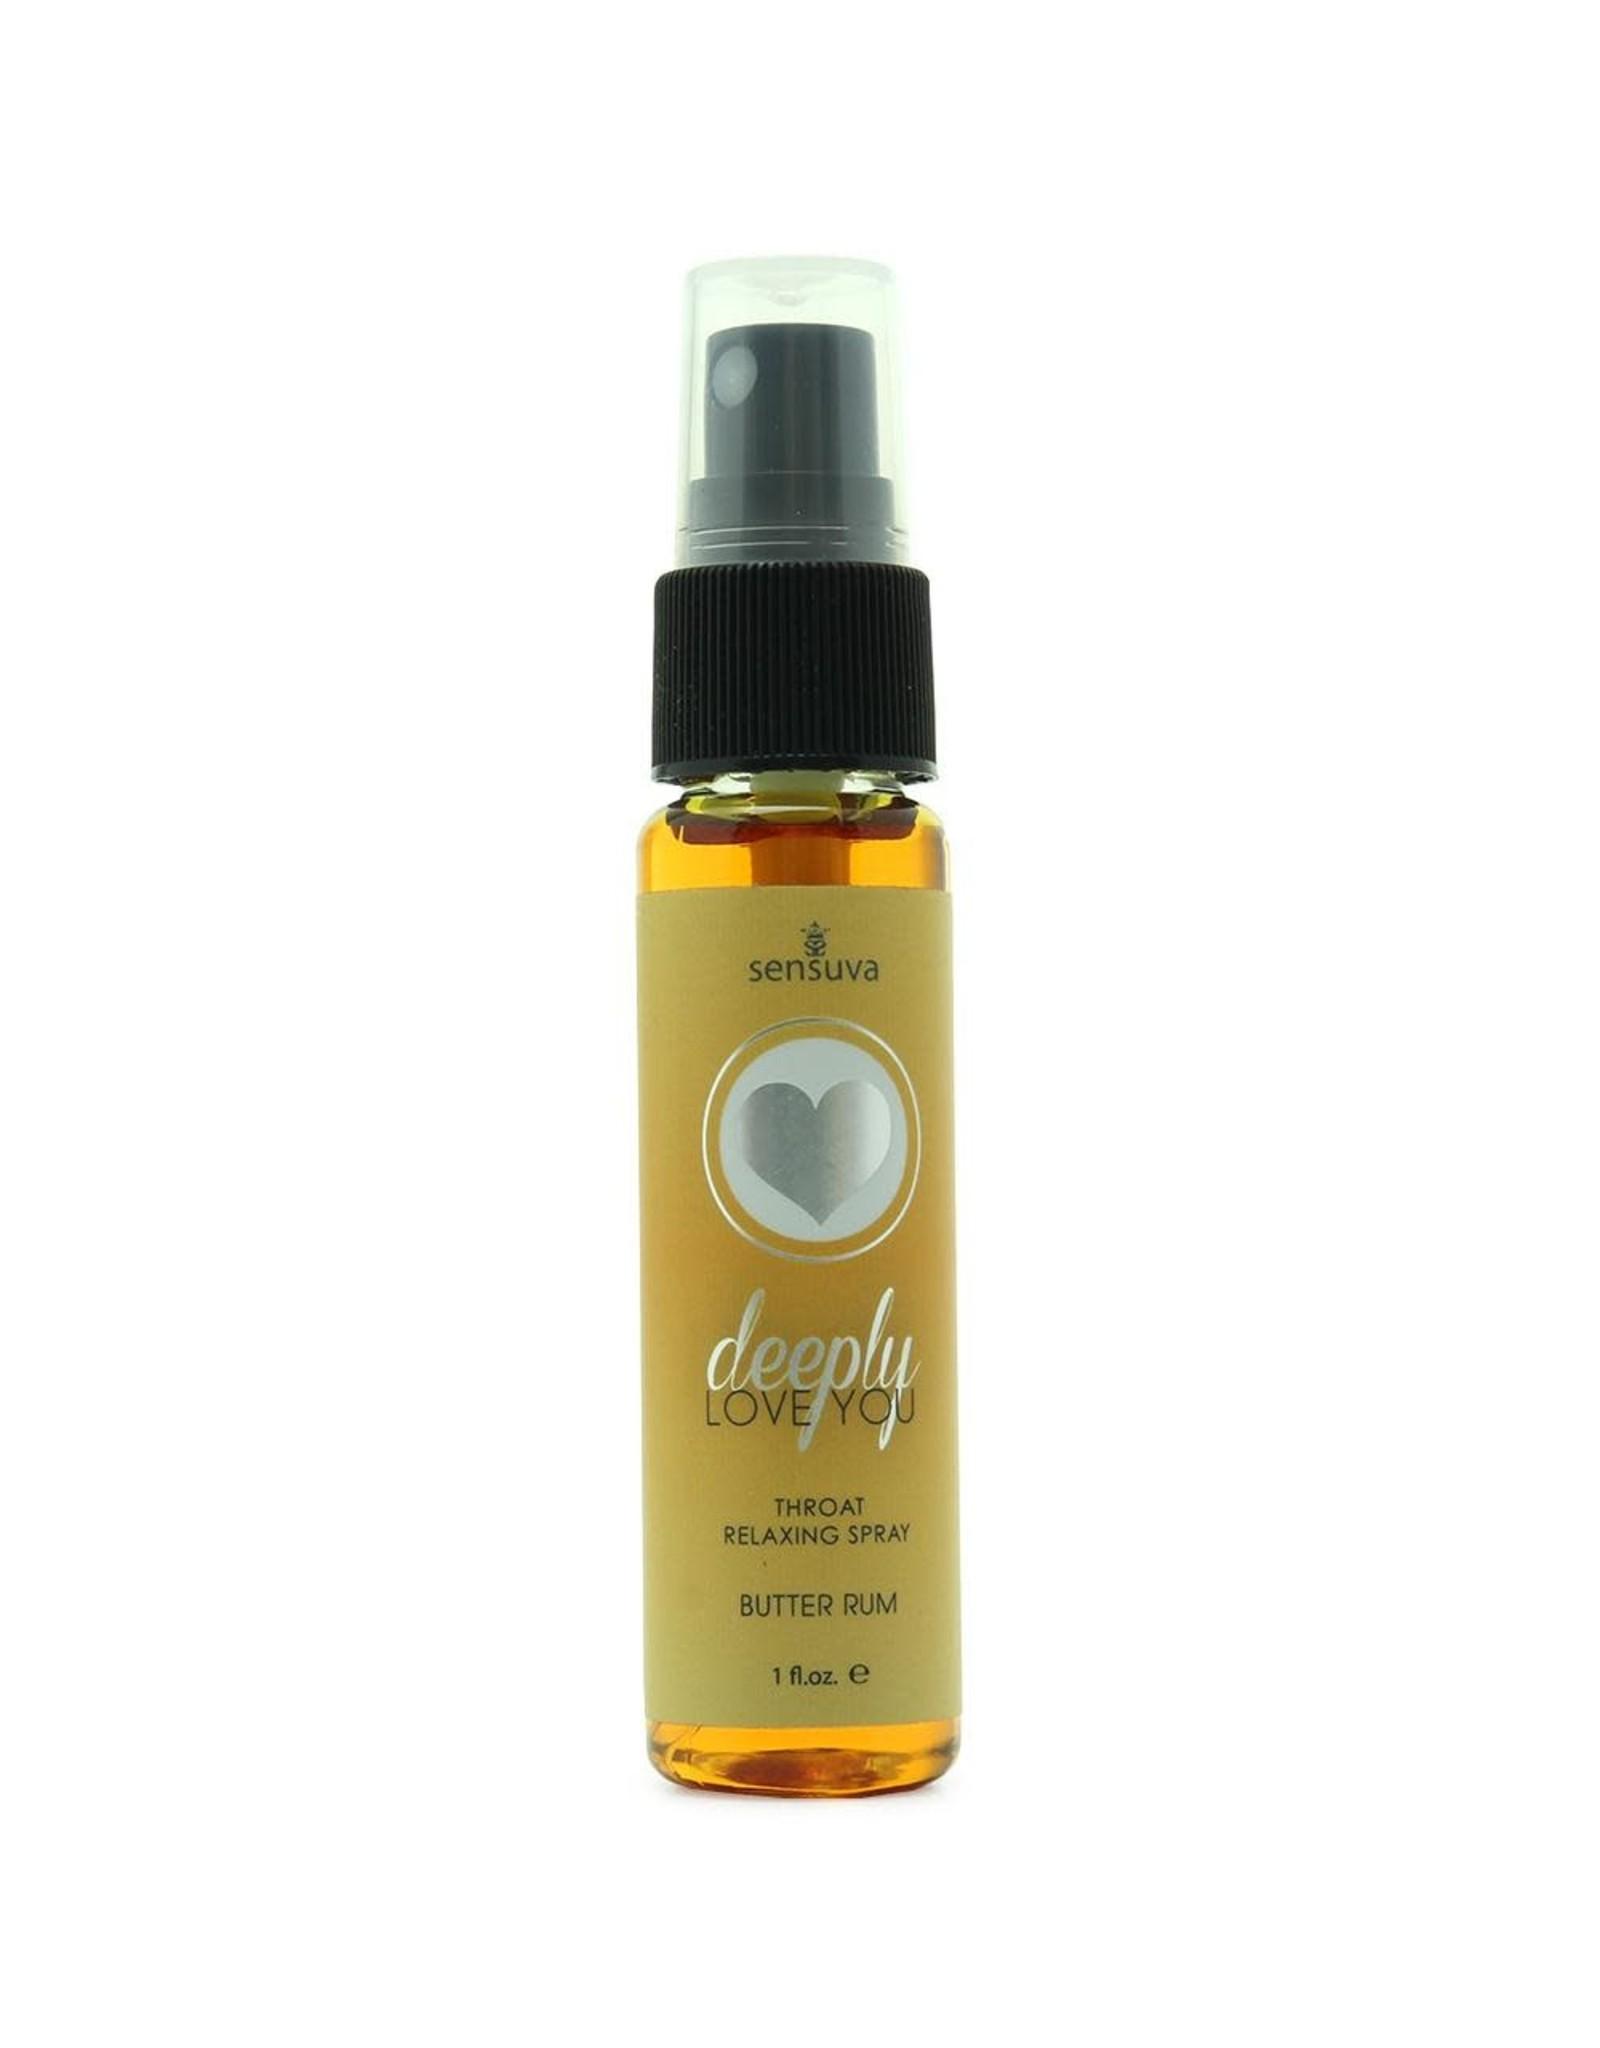 Sensuva Deeply Love You - Throat Relaxing Spray in Butter Rum - 1 oz